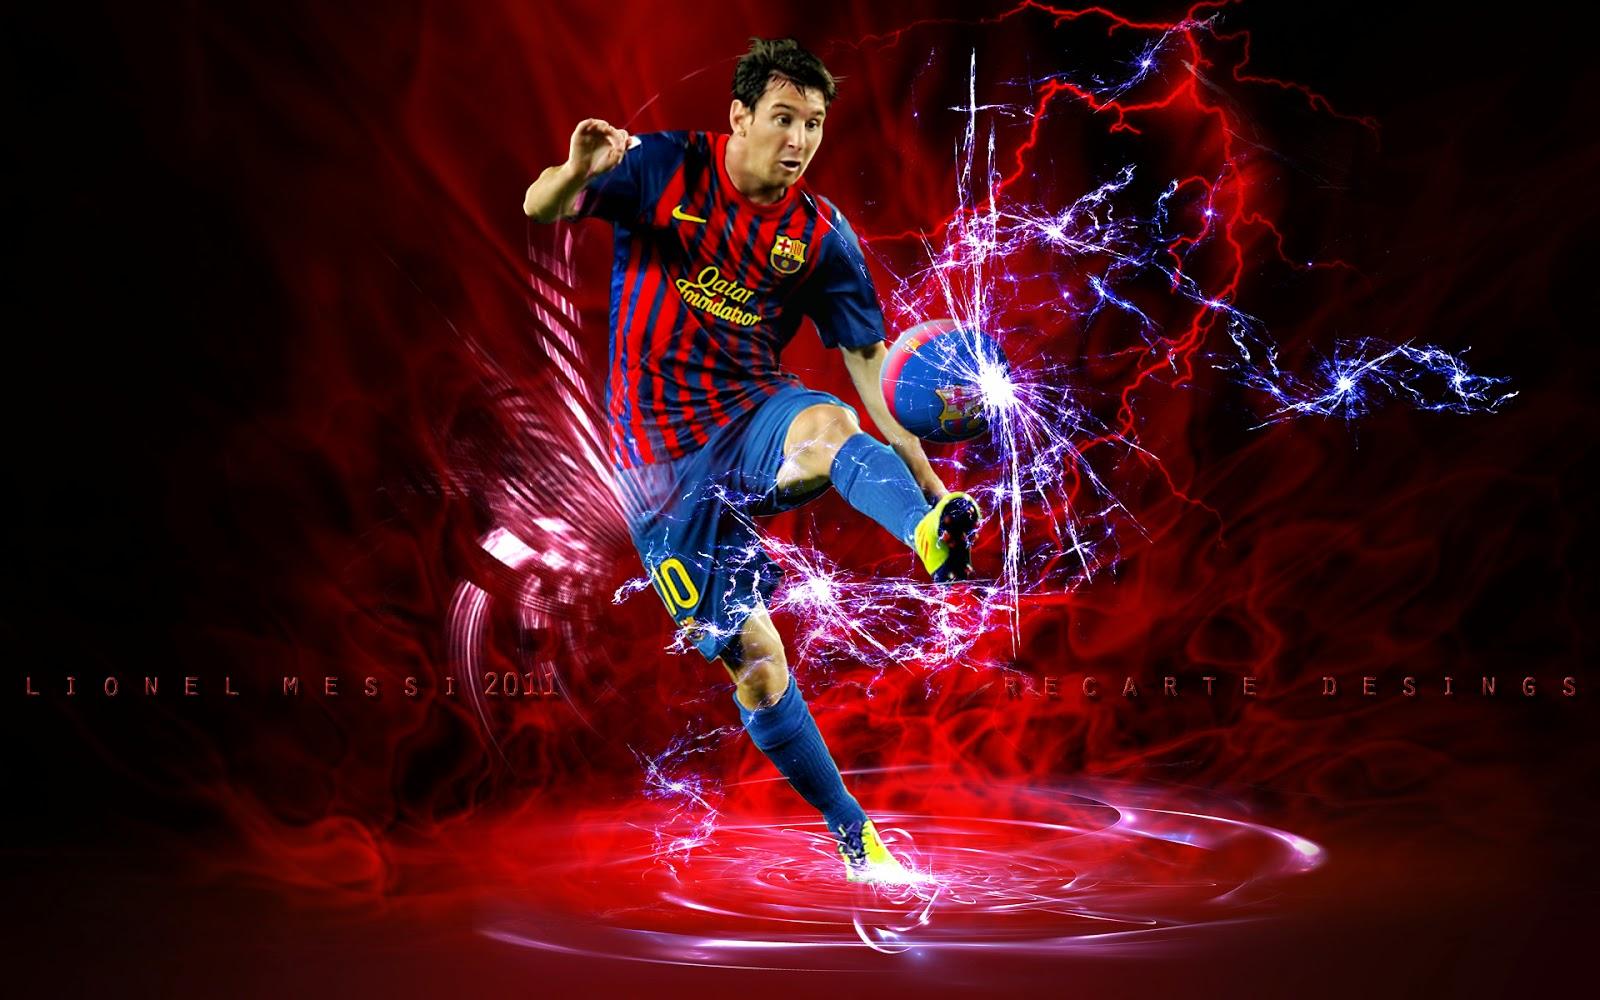 Lionel Messi Fond d'écran and Arrière-Plan   1600x1000   ID:338928 - Wallpaper Abyss